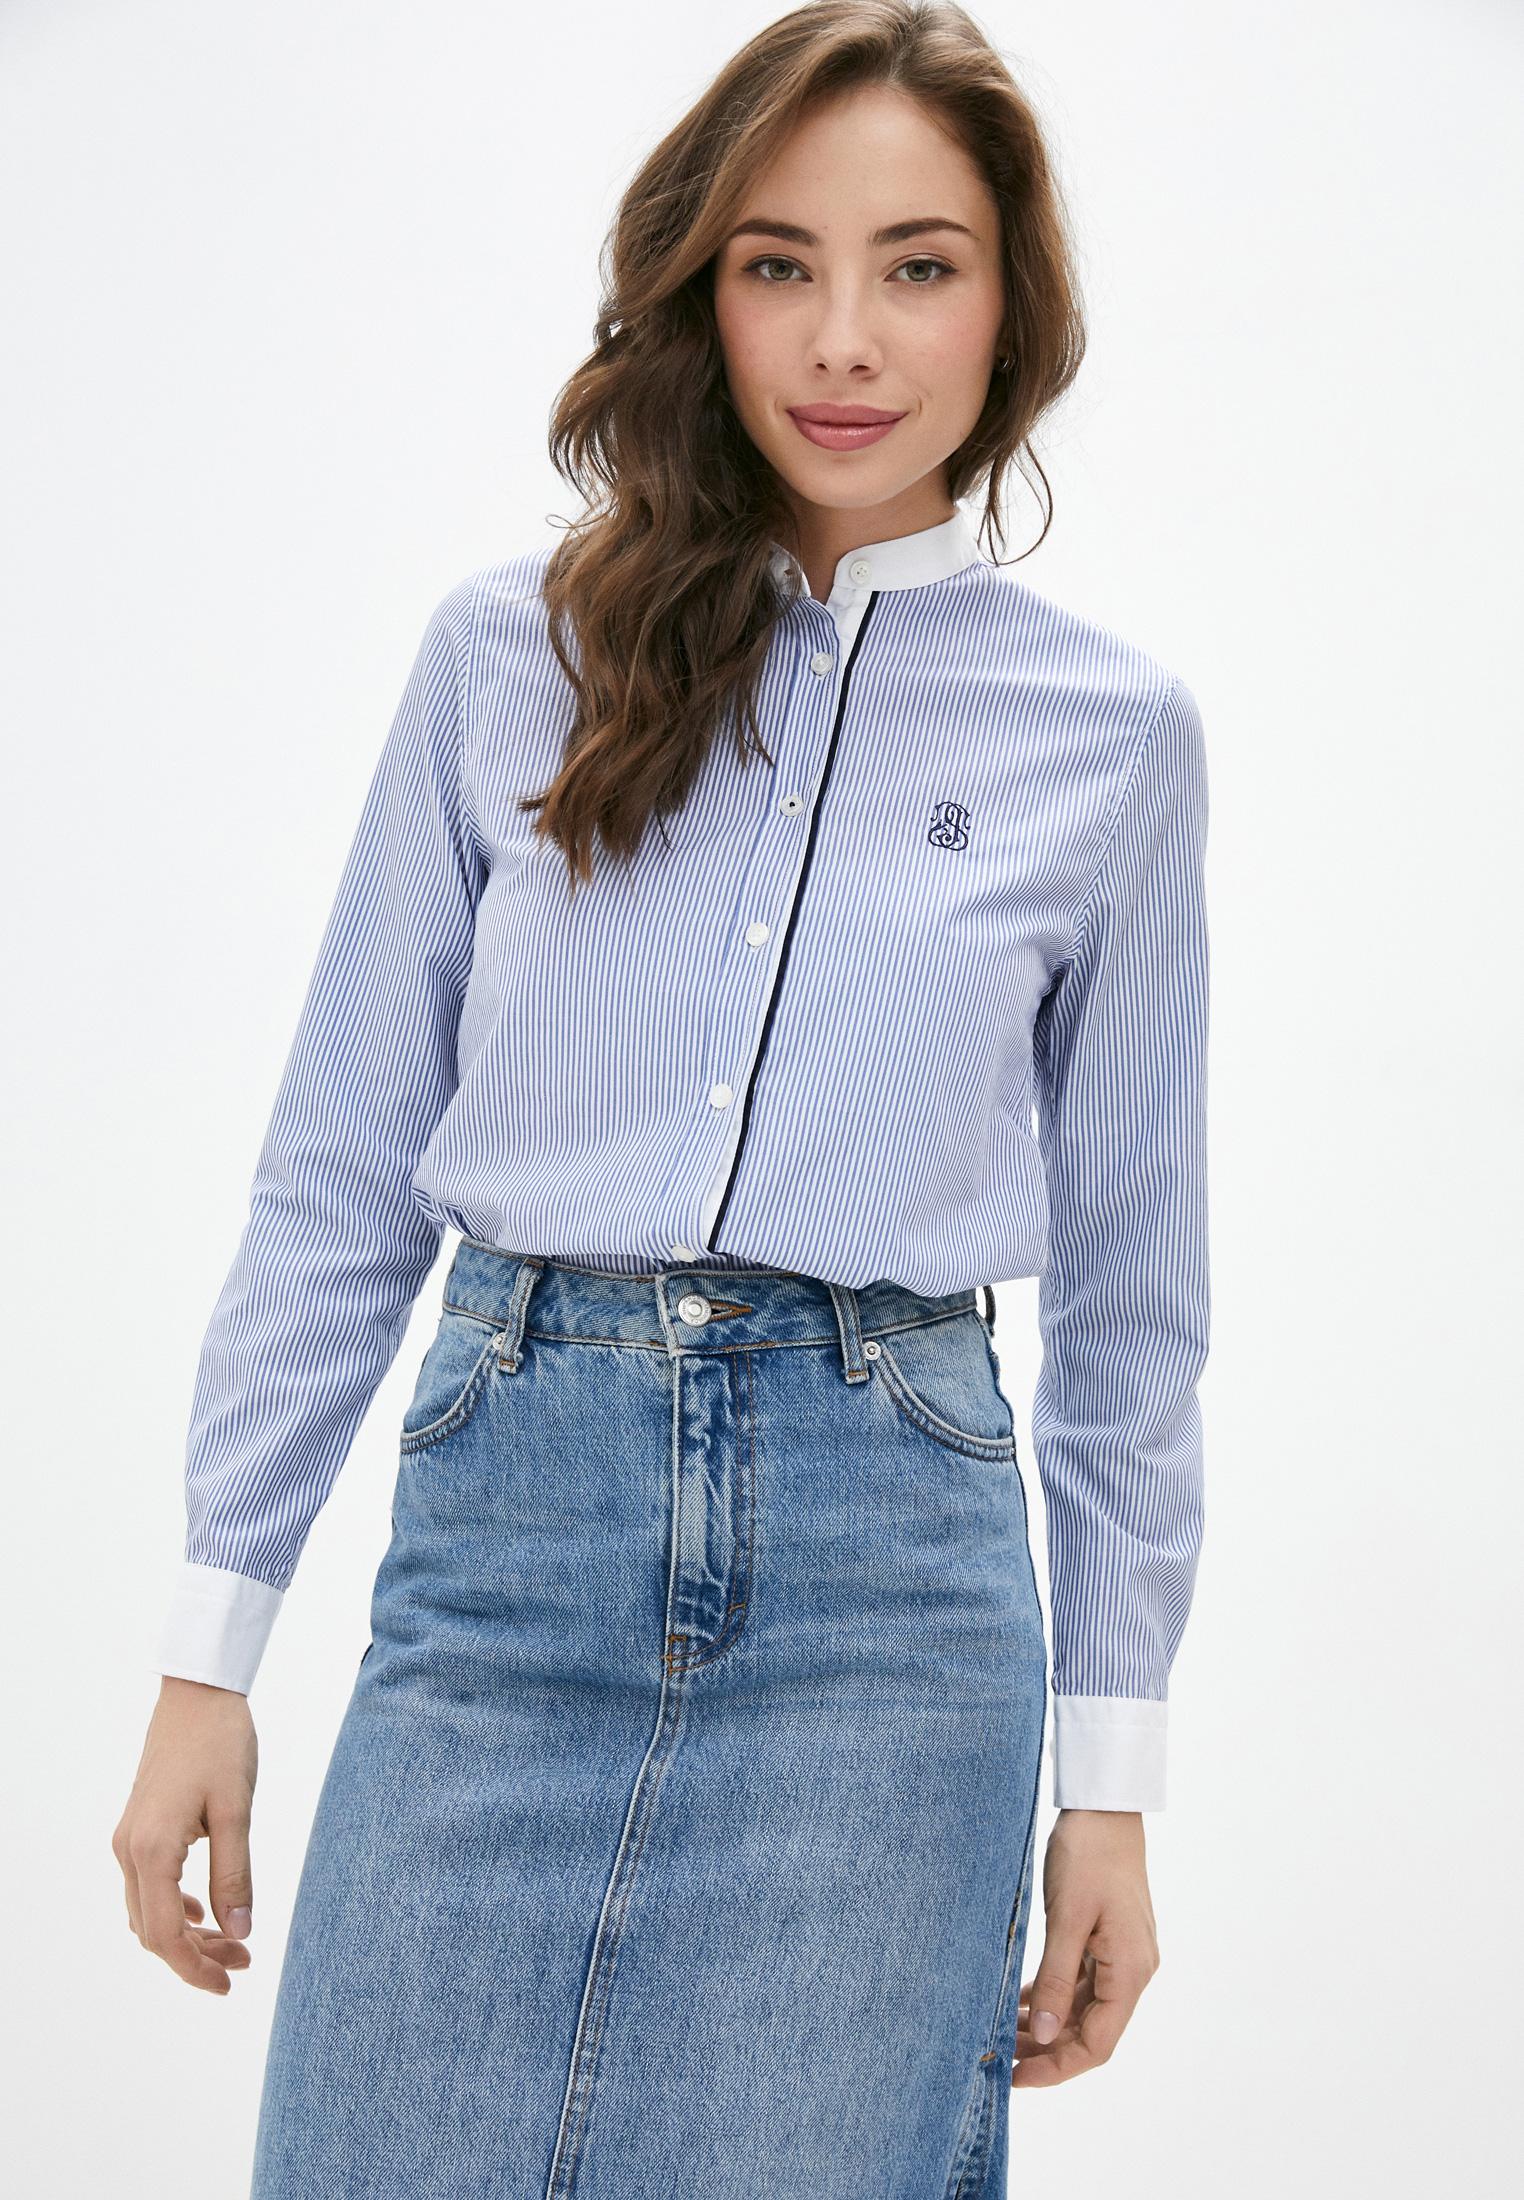 Женские рубашки с длинным рукавом JIMMY SANDERS (Джимми Сандерс) Рубашка Jimmy Sanders